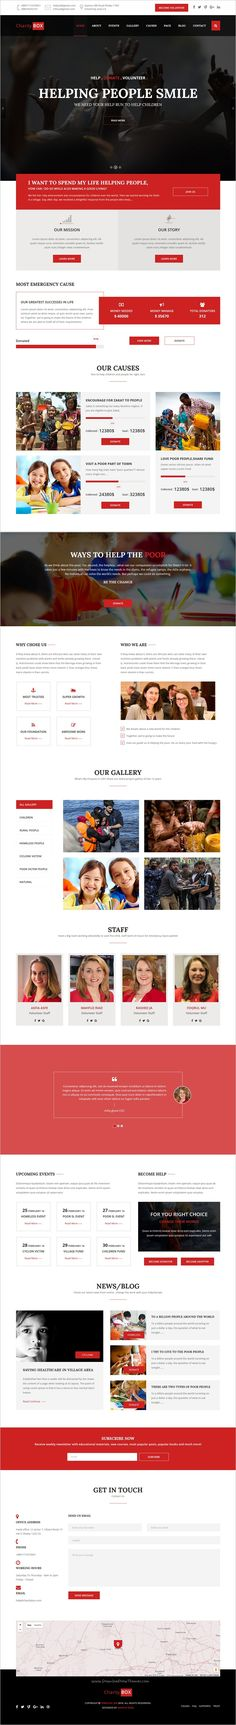 GreenWorld - Nonprofit Environment Responsive HTML5 Template - ngo templates